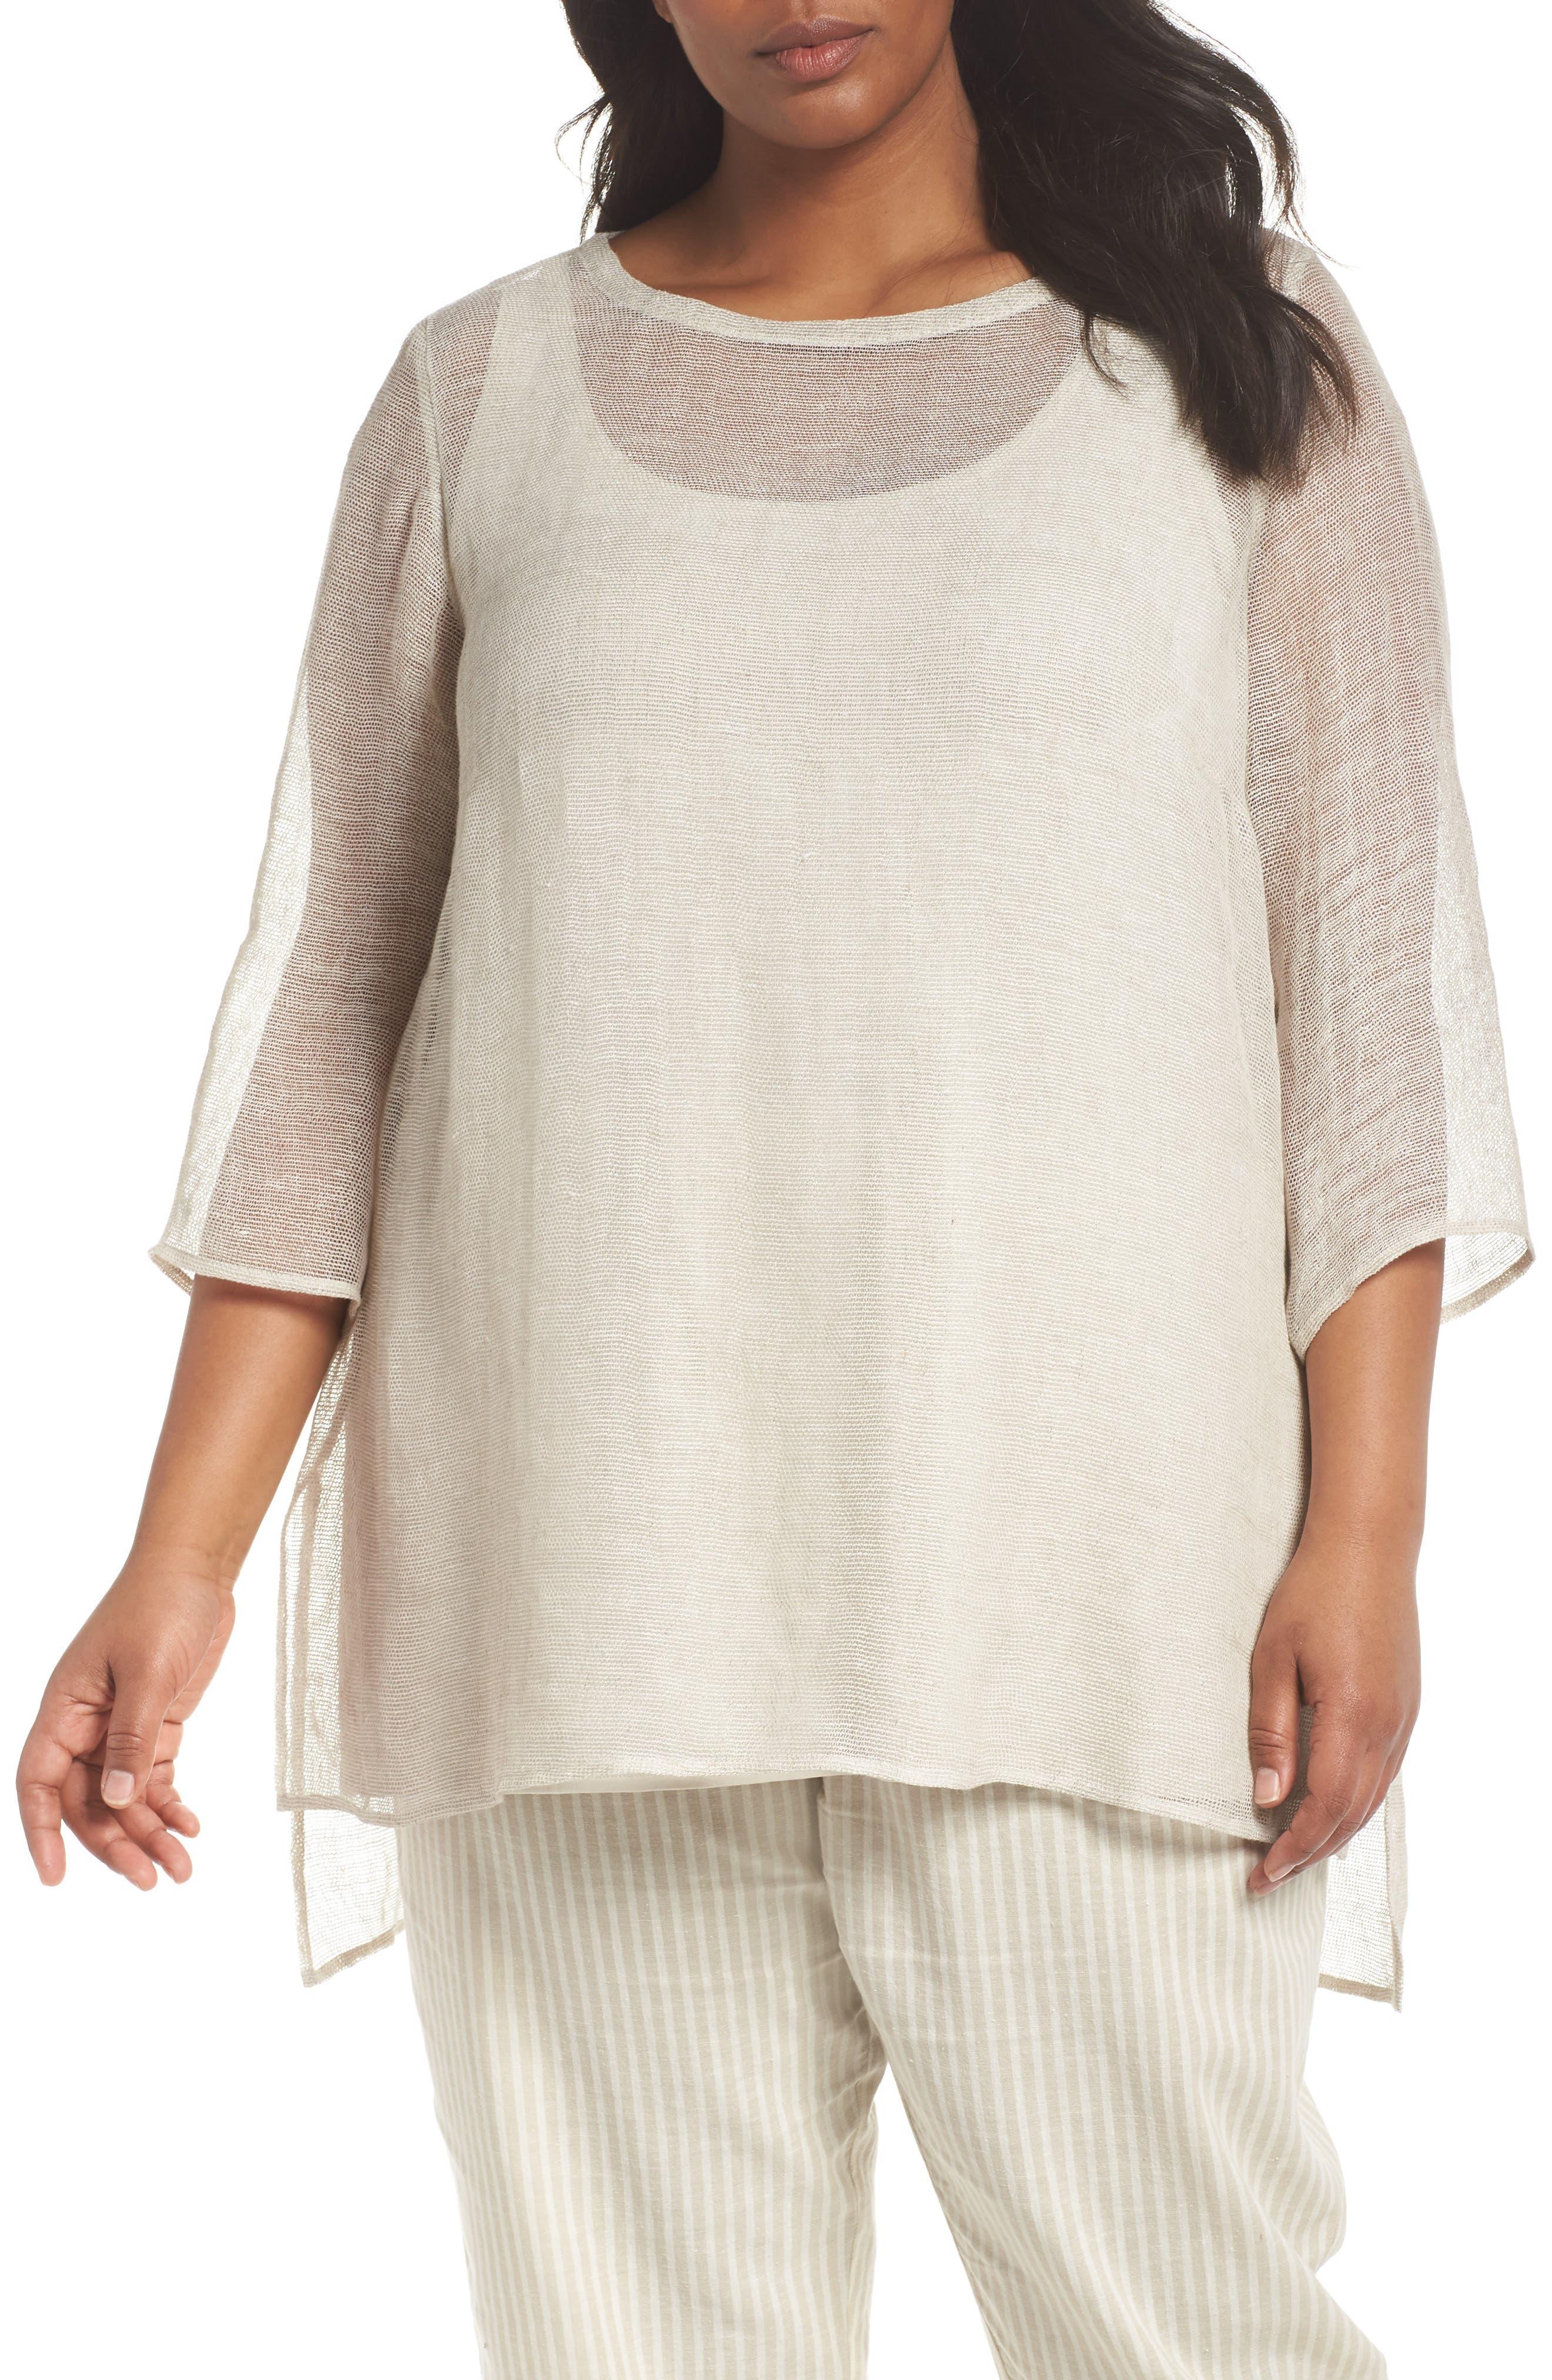 Organic Linen Mesh Tunic,                         Main,                         color, Undyed Natural